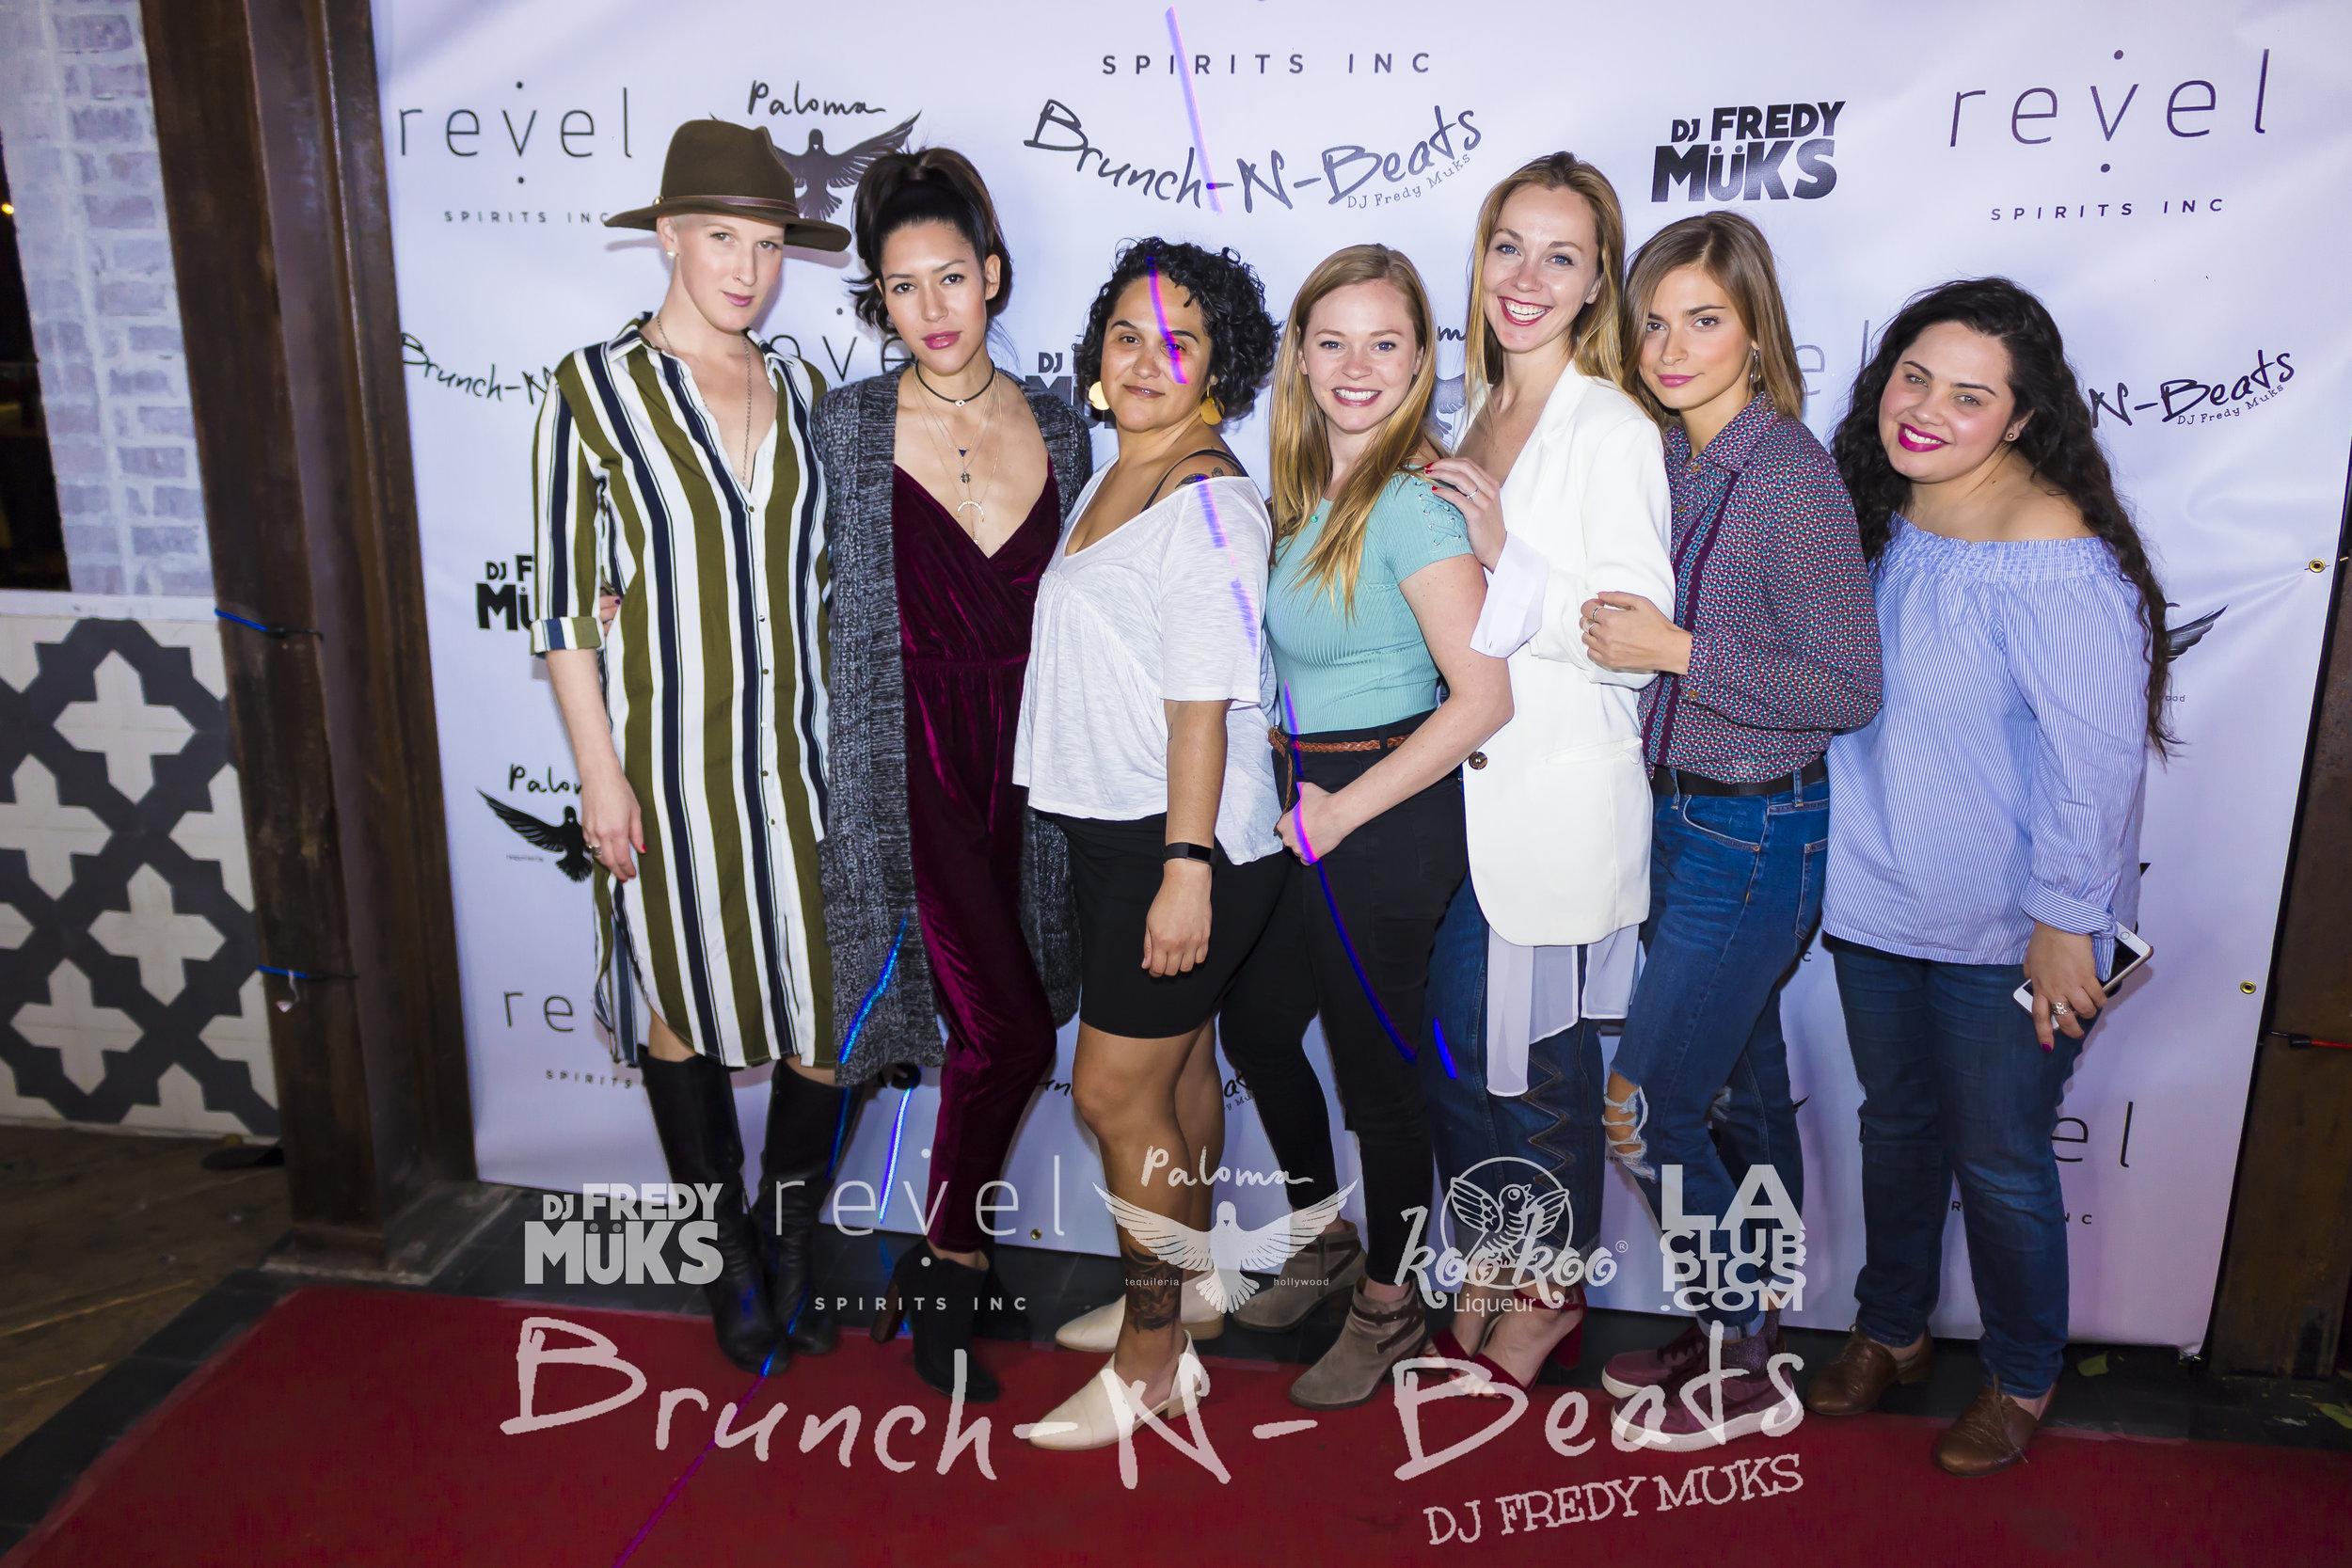 Brunch-N-Beats - Paloma Hollywood - 02-25-18_64.jpg